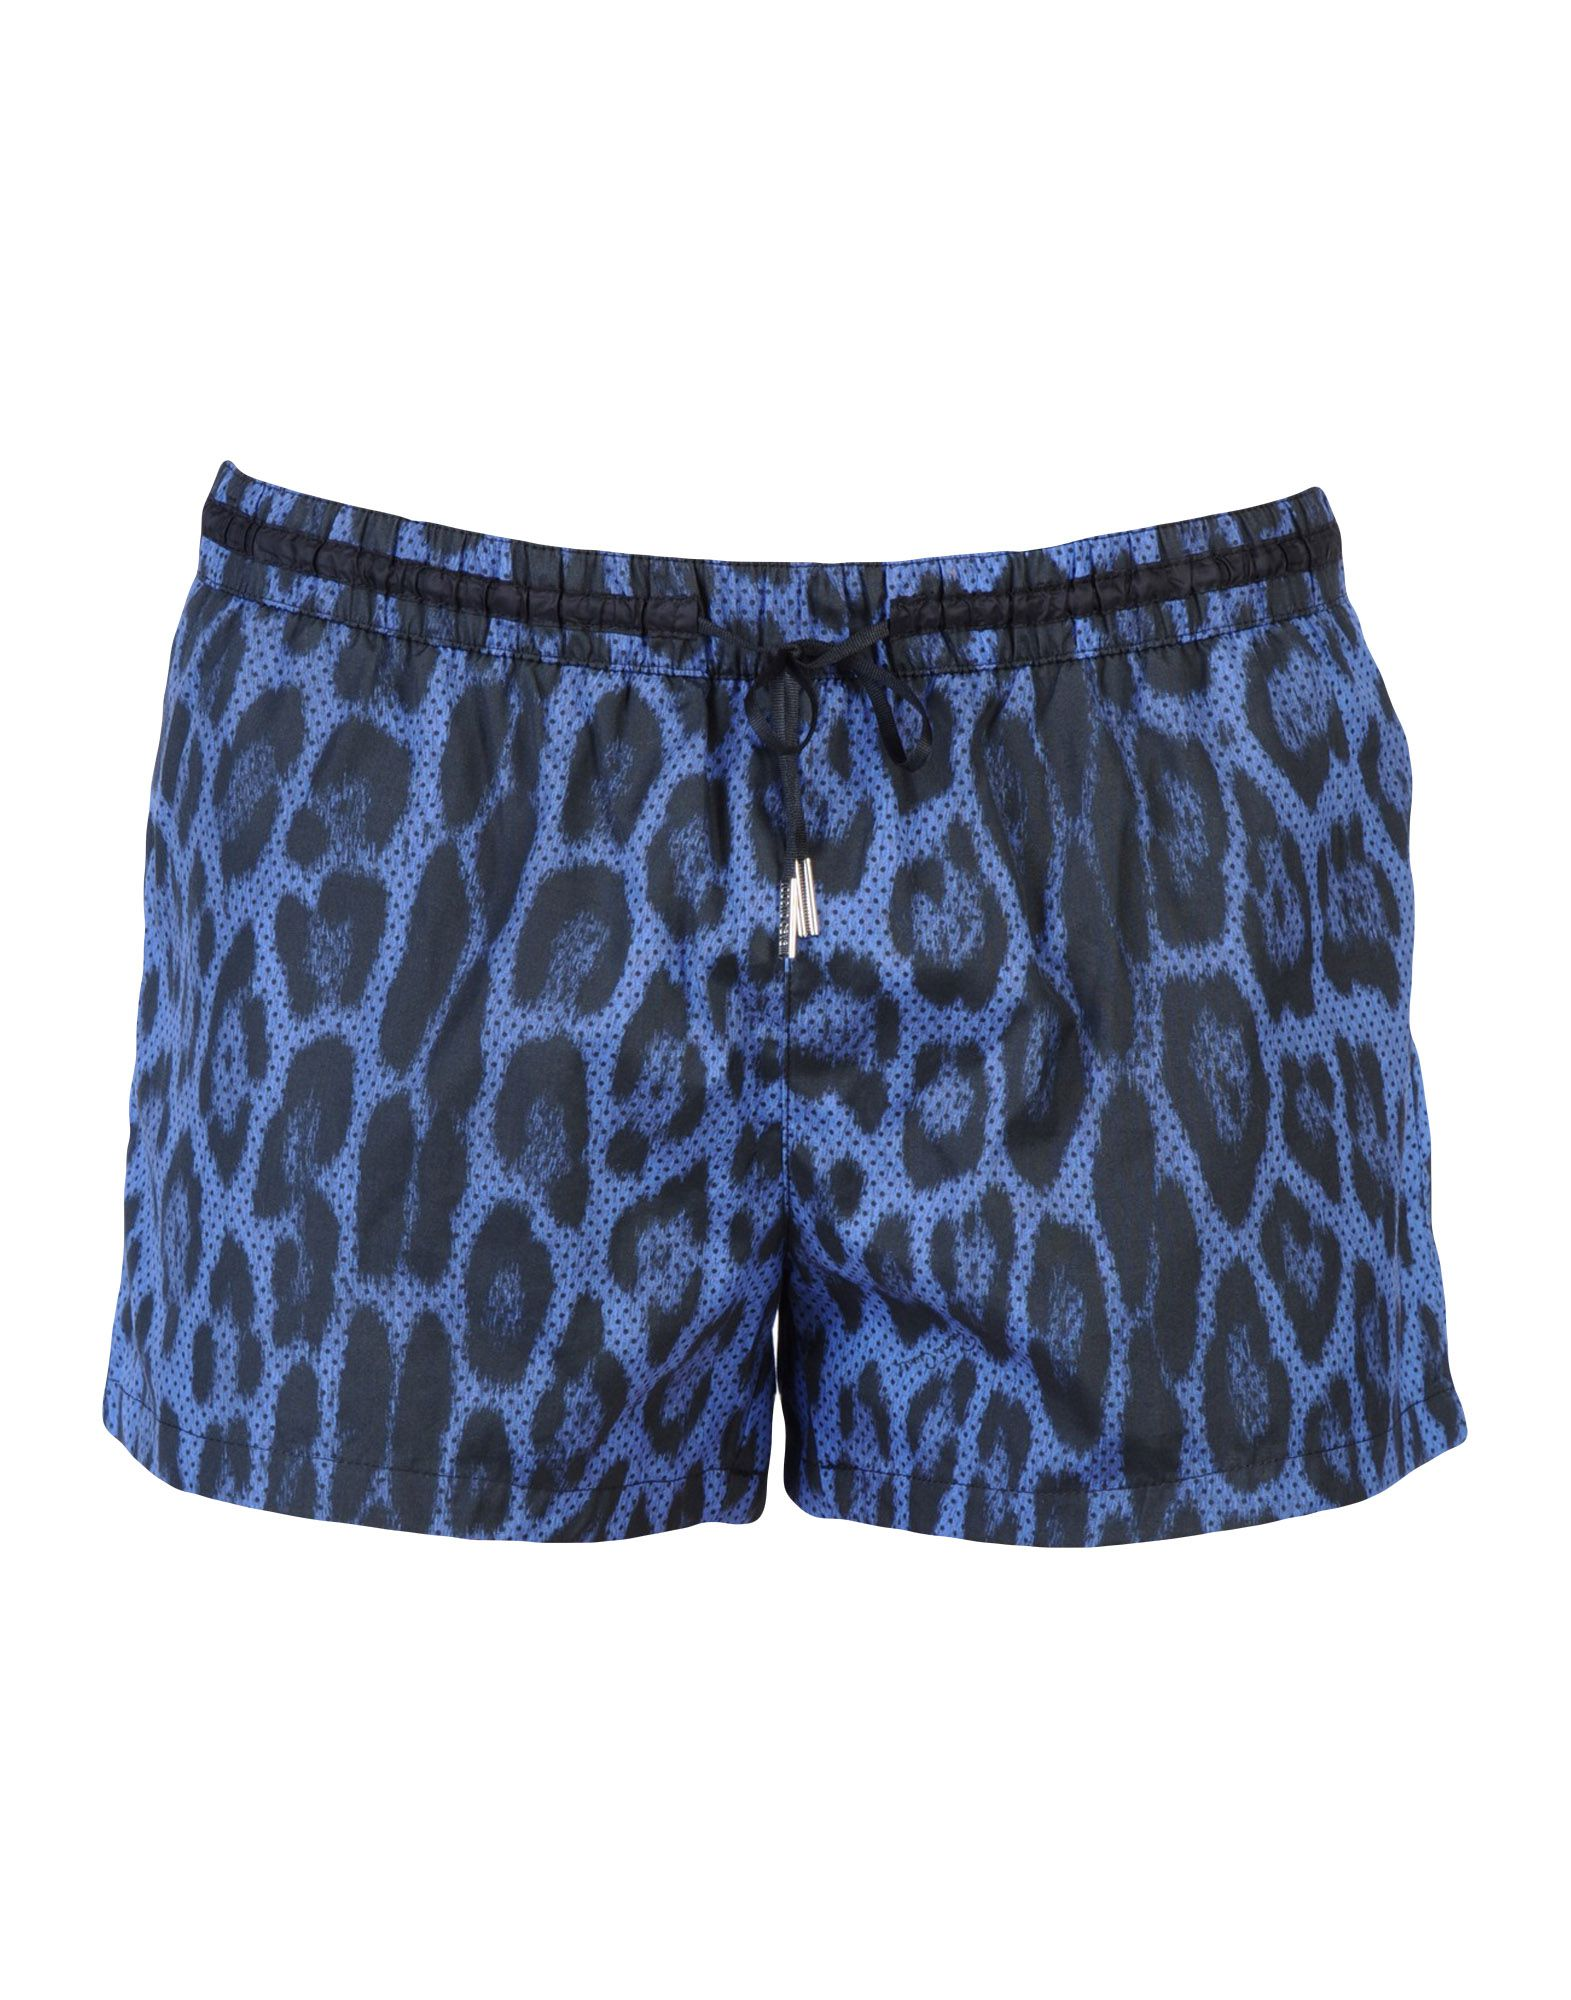 ROBERTO CAVALLI BEACHWEAR Swim Shorts in Blue